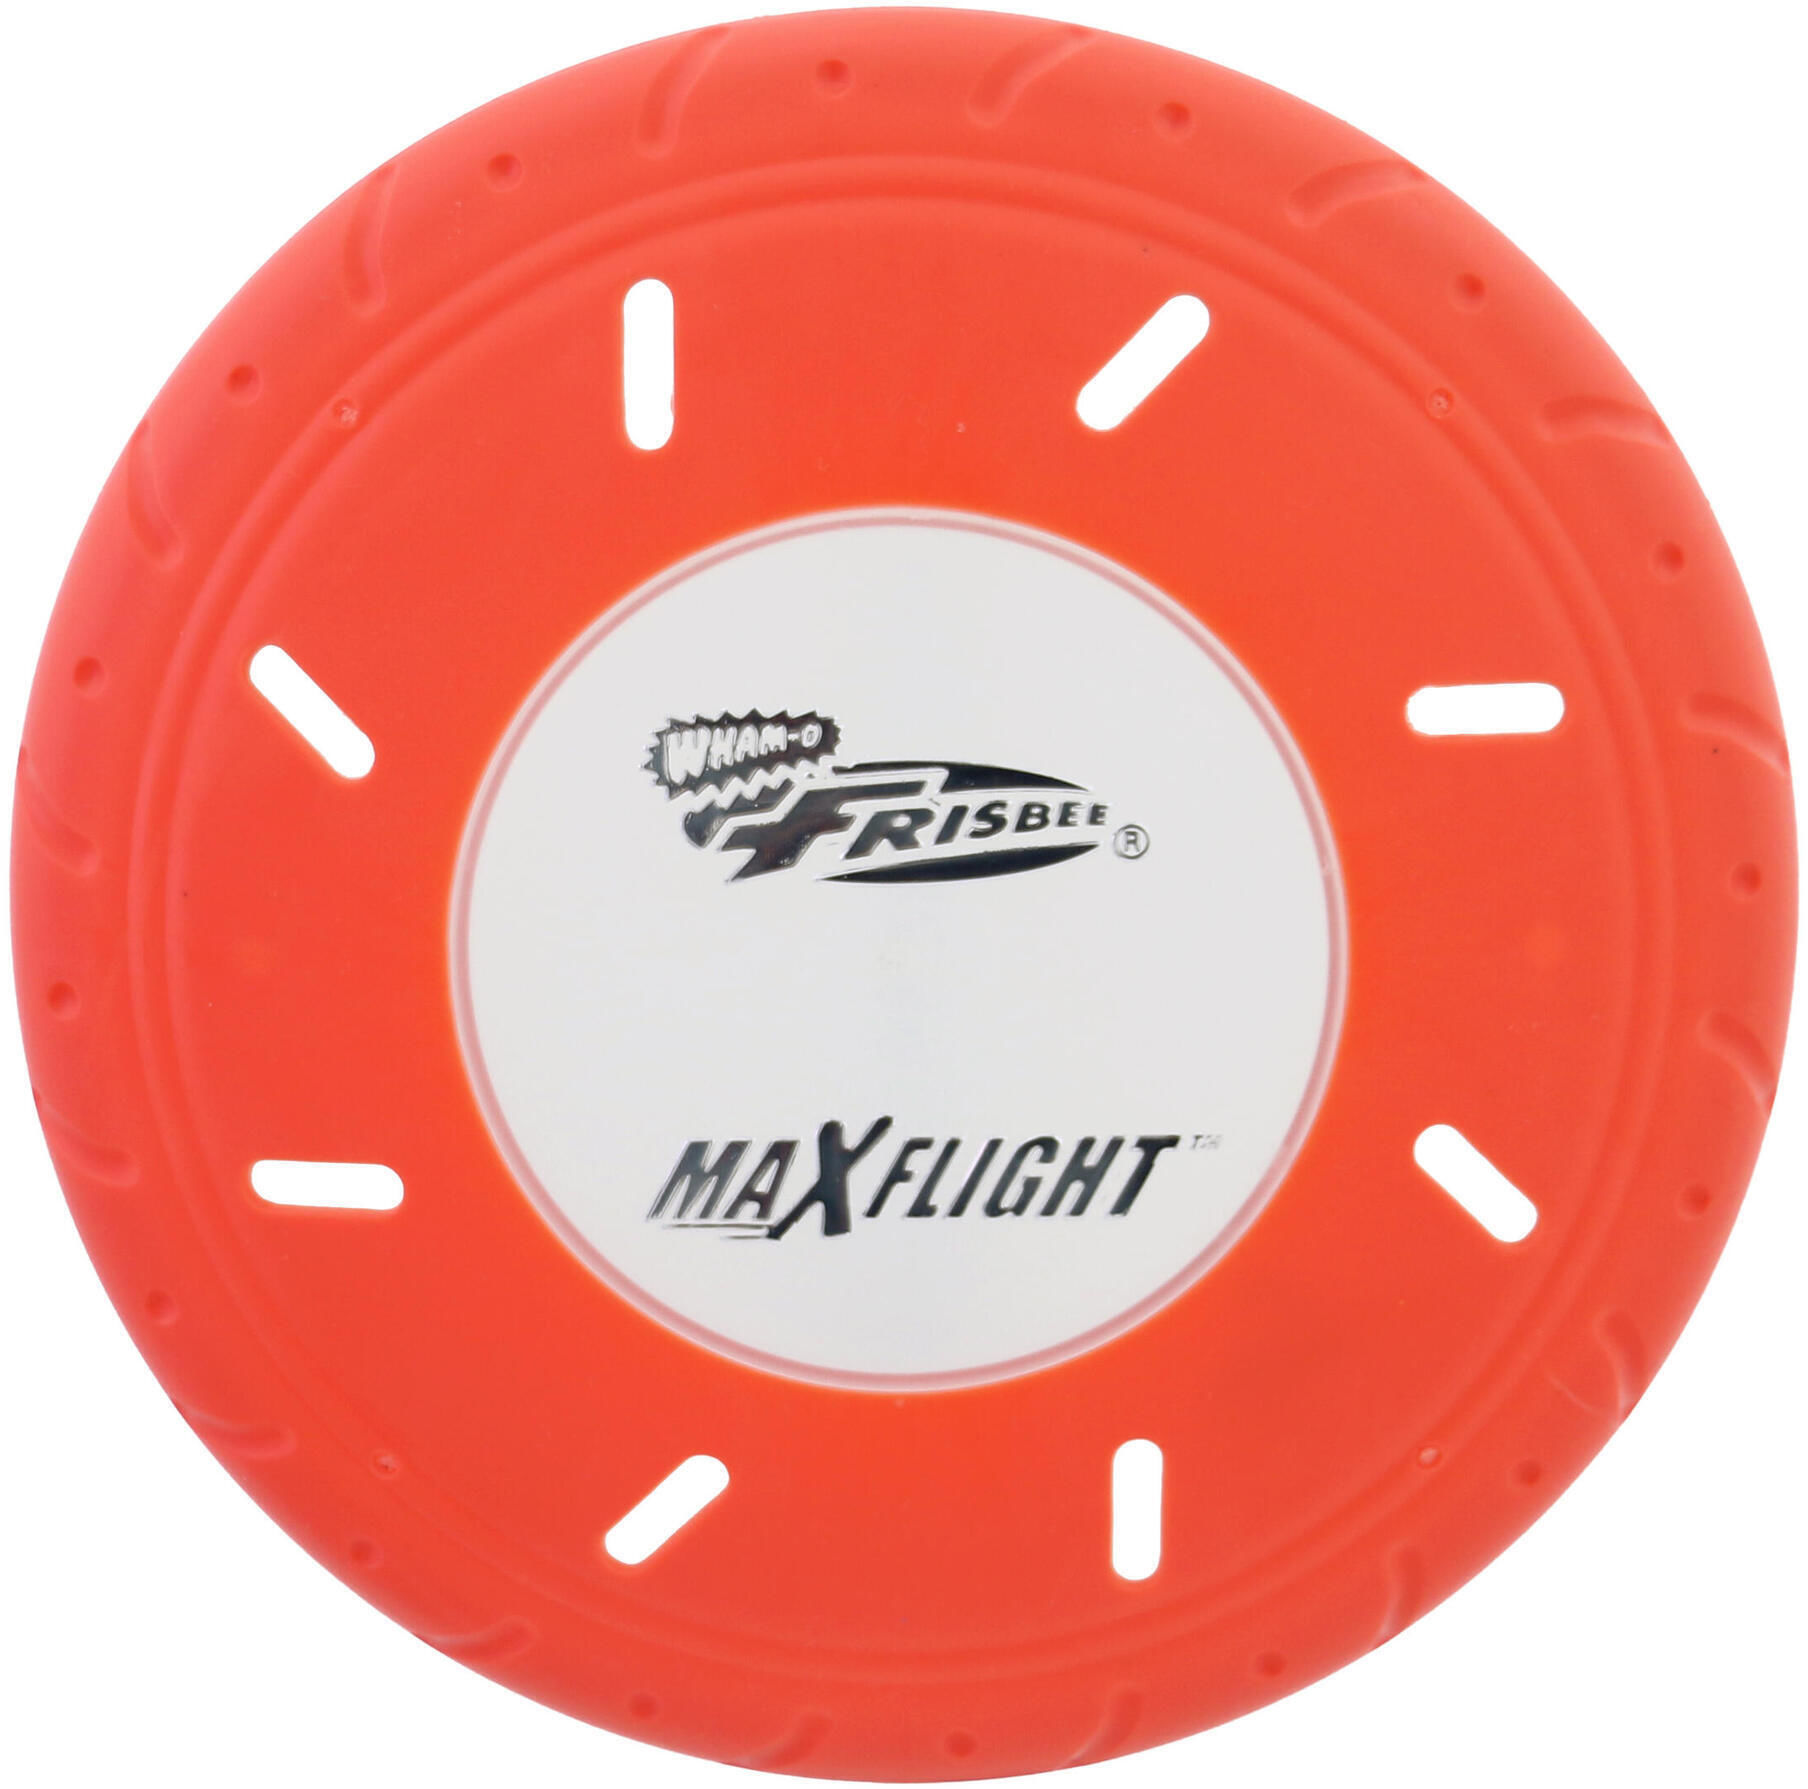 Frisbee Fosforescencyjne